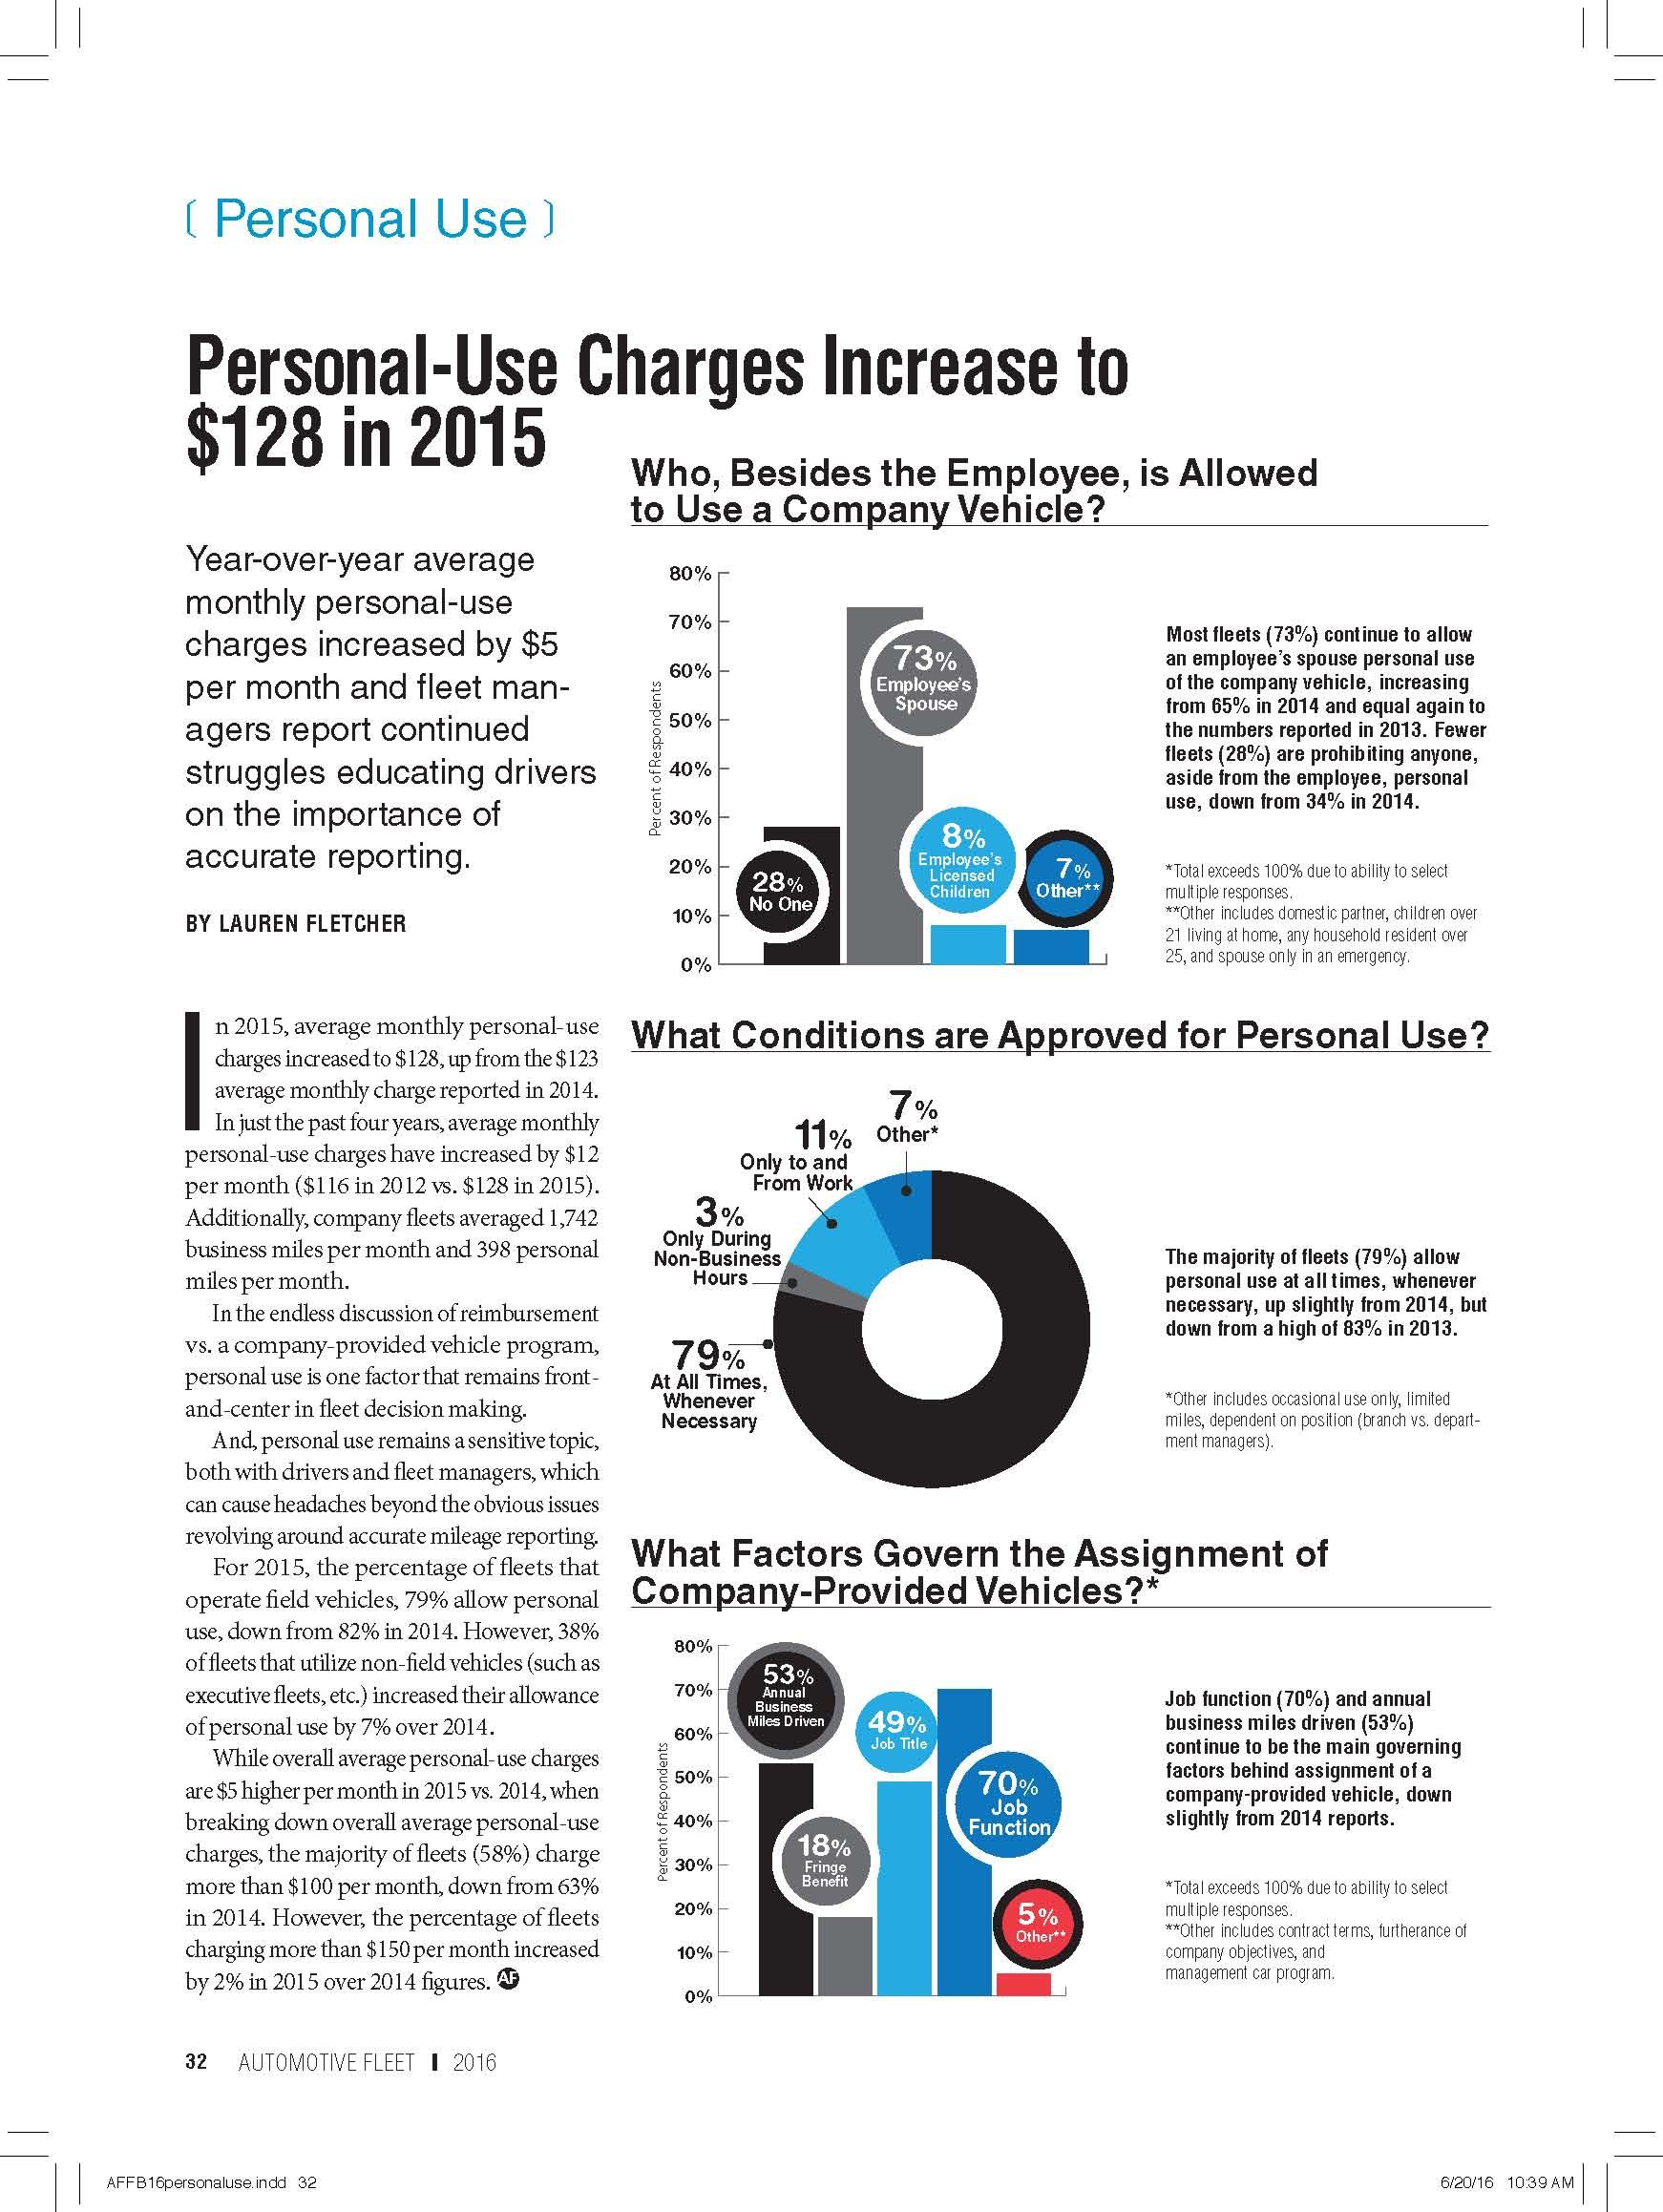 2015 Personal-Use Statistics